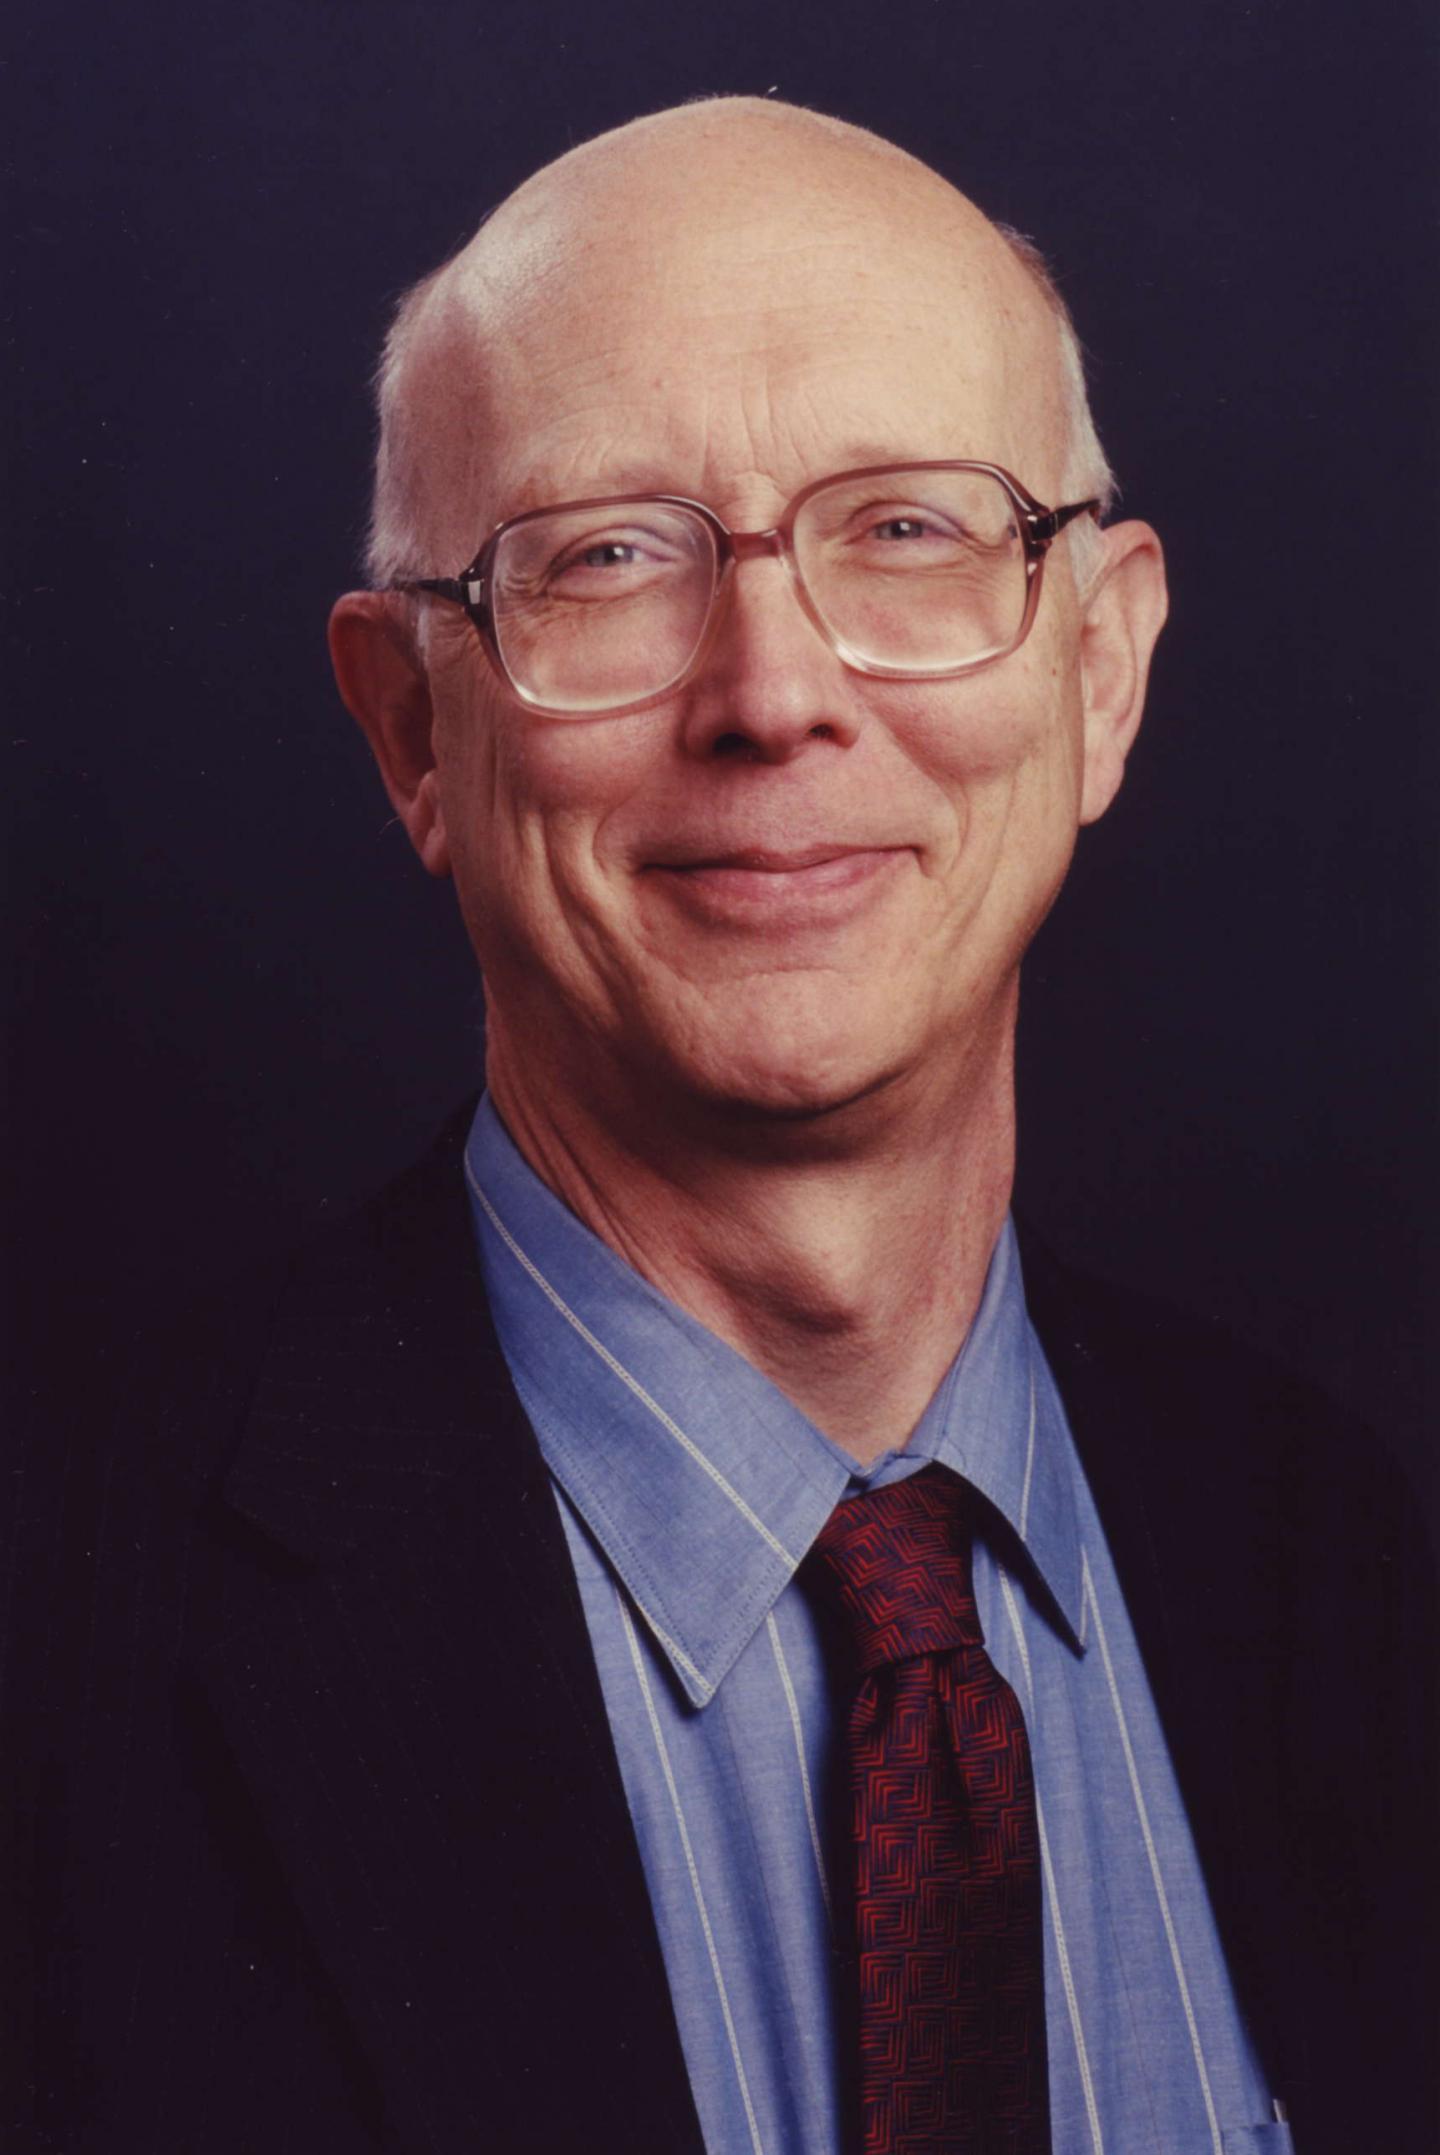 George Whitesides, Harvard University